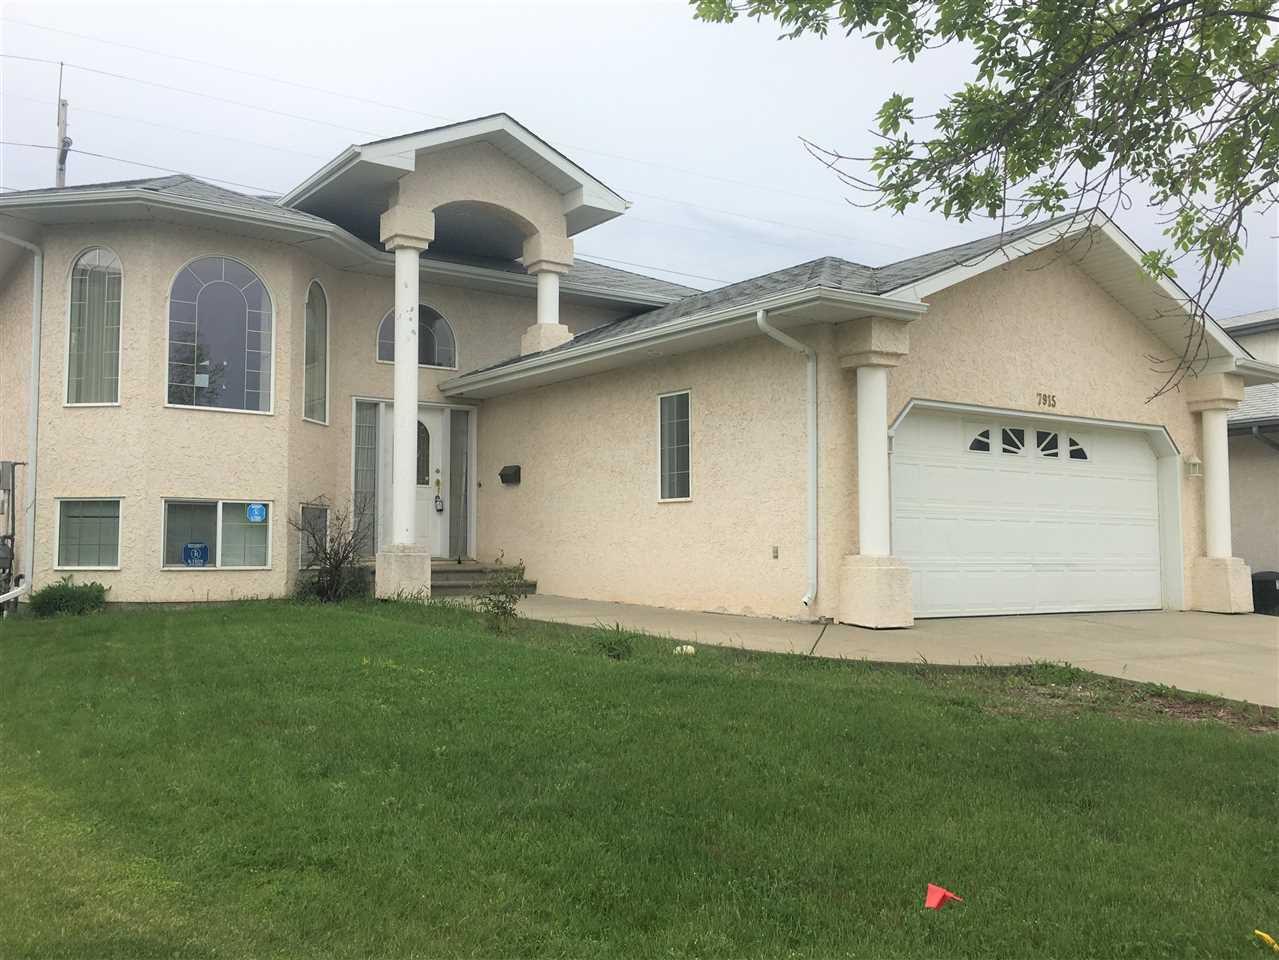 Main Photo: 7915 164 Avenue in Edmonton: Zone 28 House for sale : MLS®# E4161736